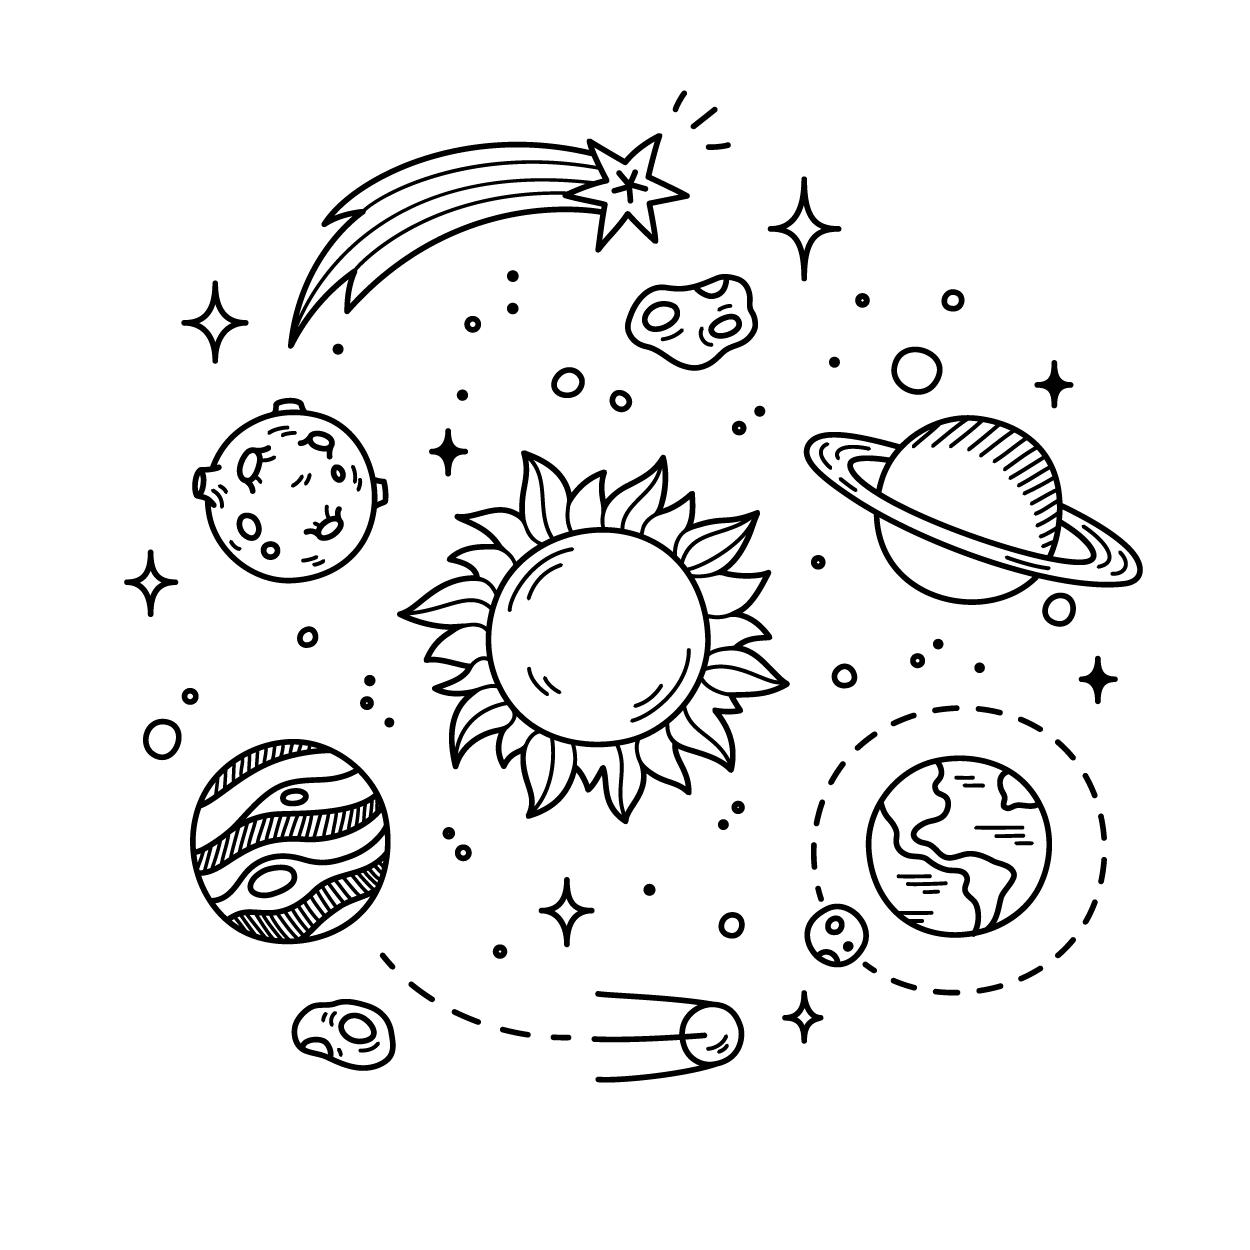 spaceship of alien illustration google 검색 16fw pinterest